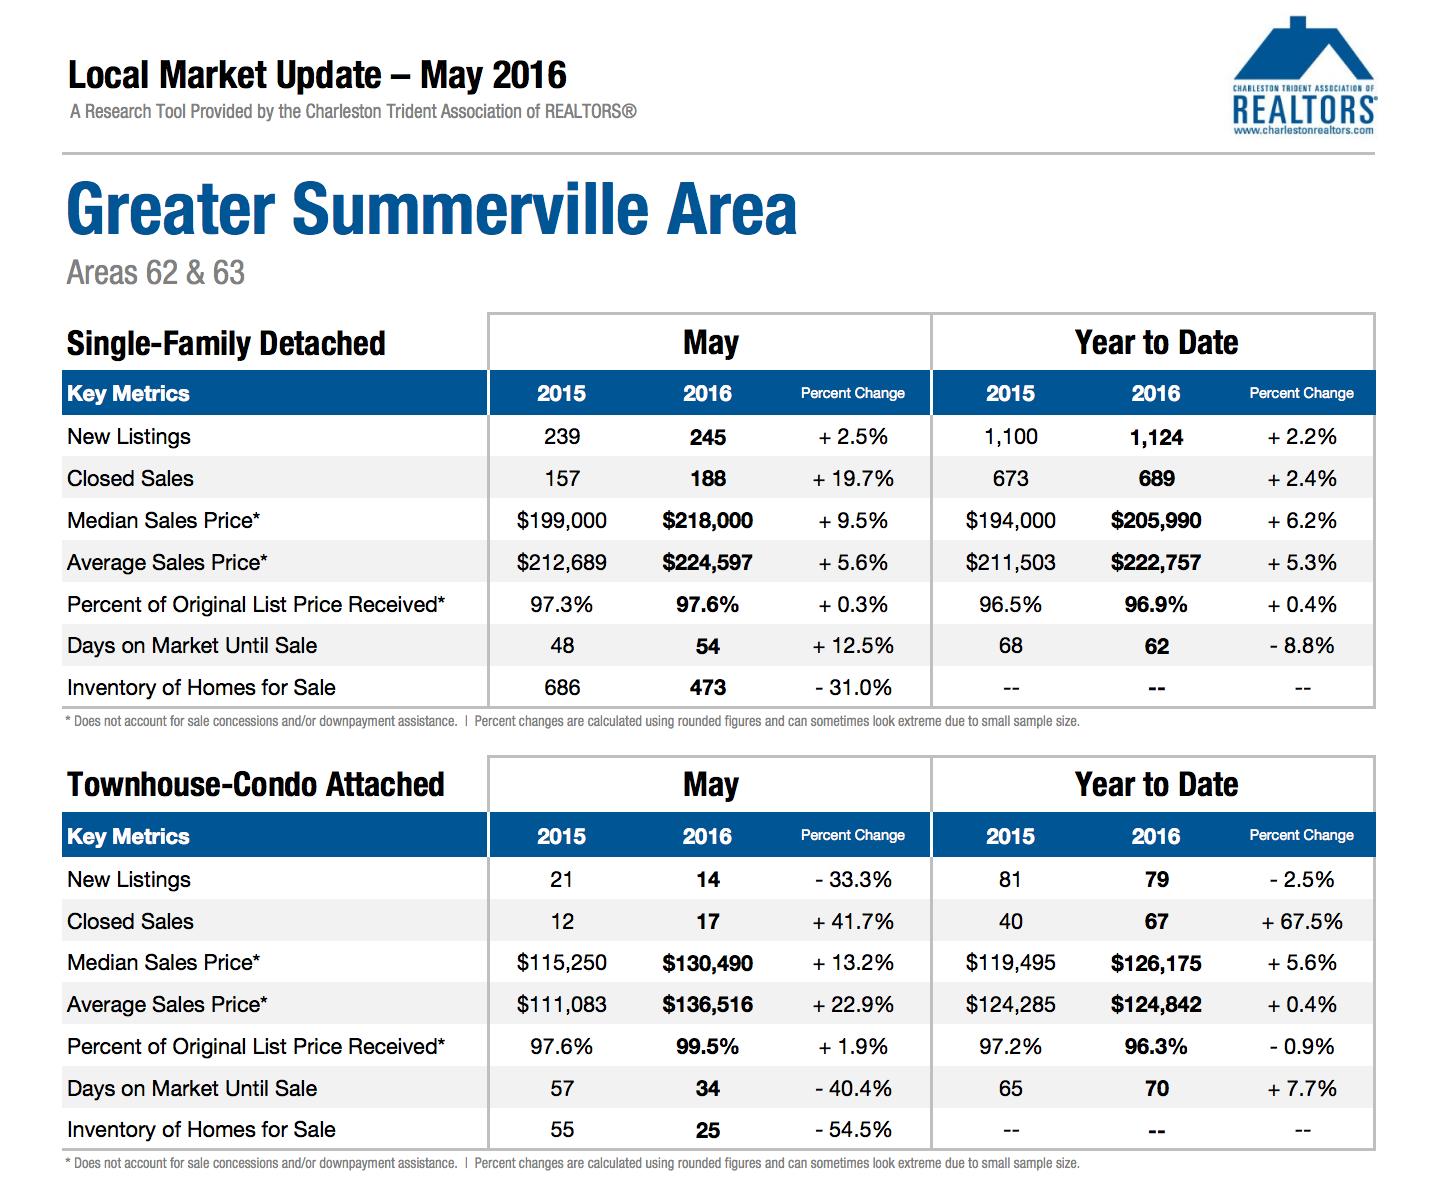 Summerville Market Update May 2016